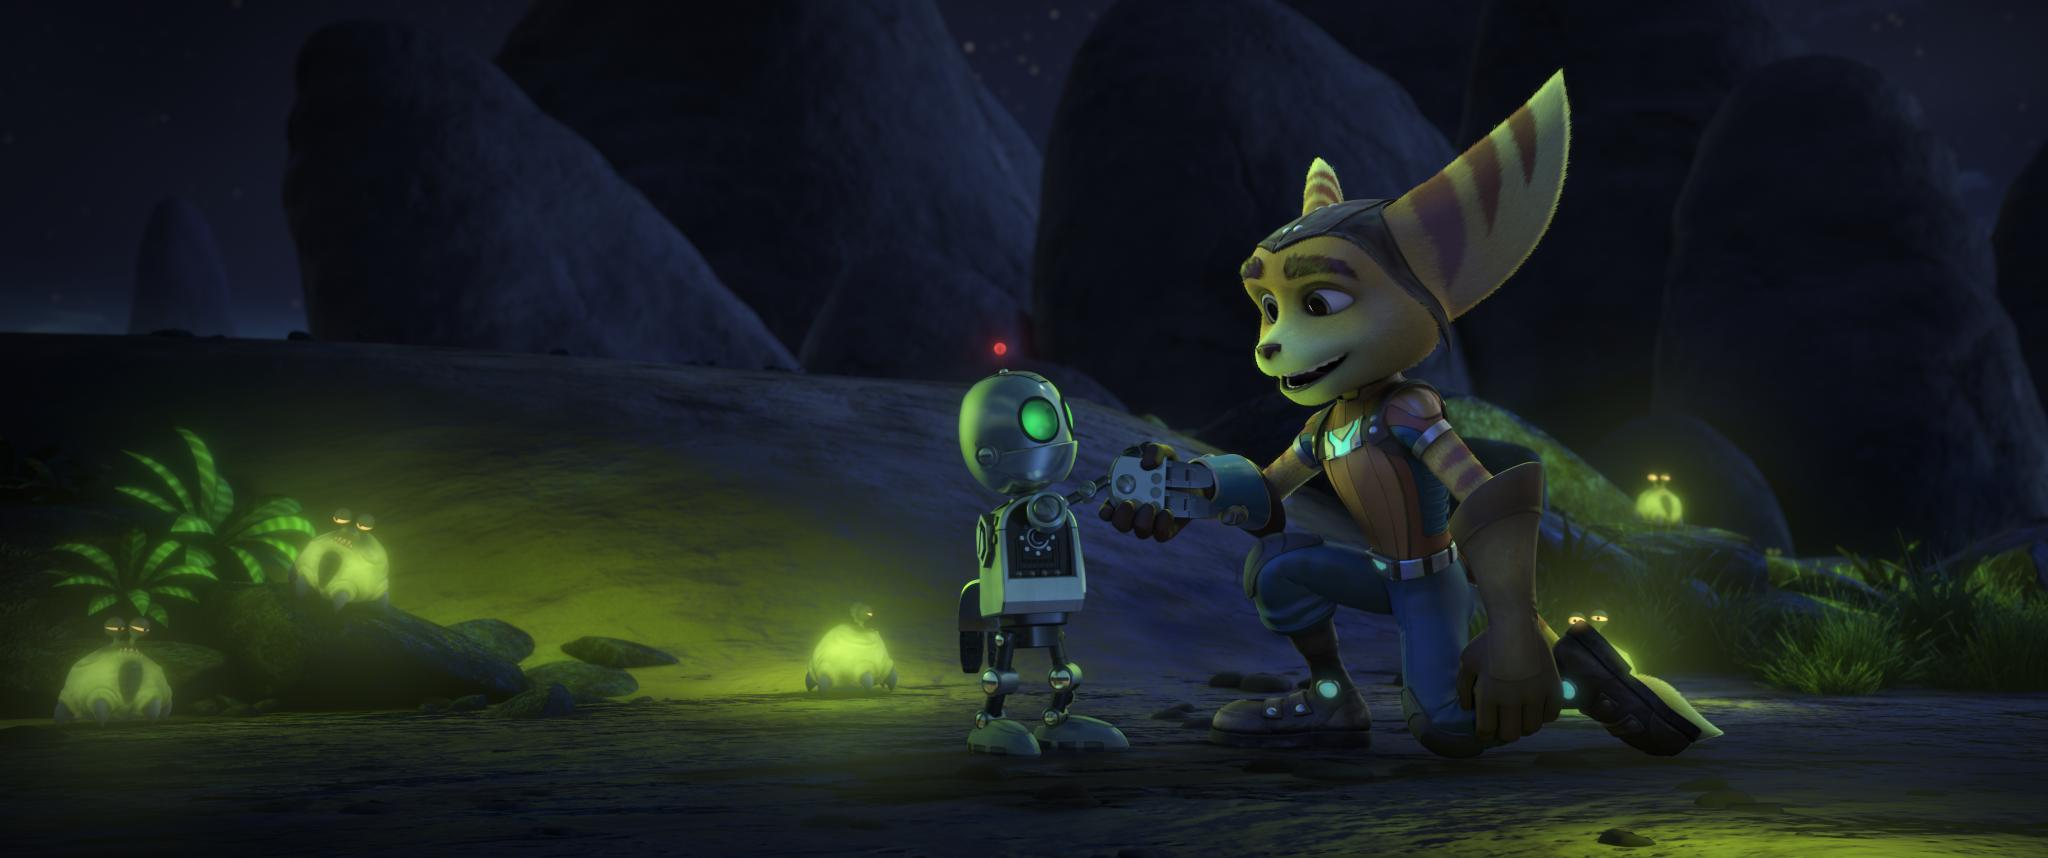 Скриншот Ratchet and Clank